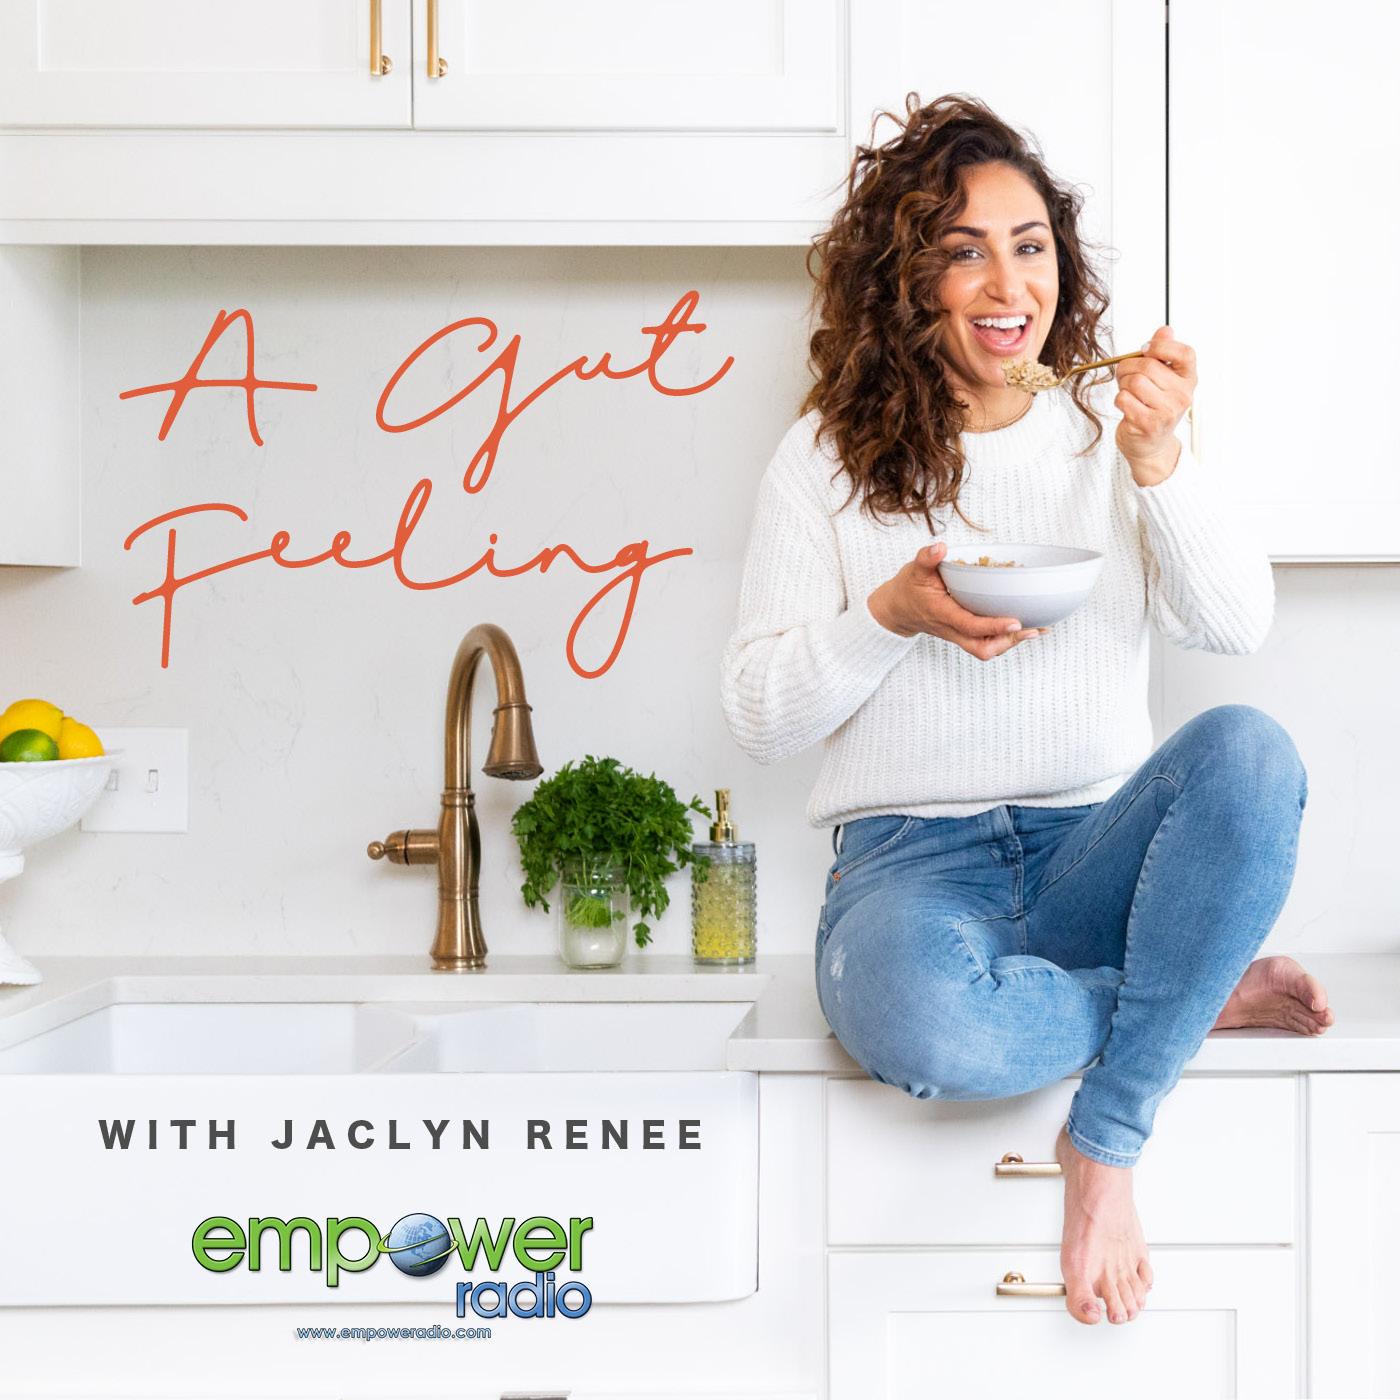 A Gut Feeling with Jaclyn Renee show art